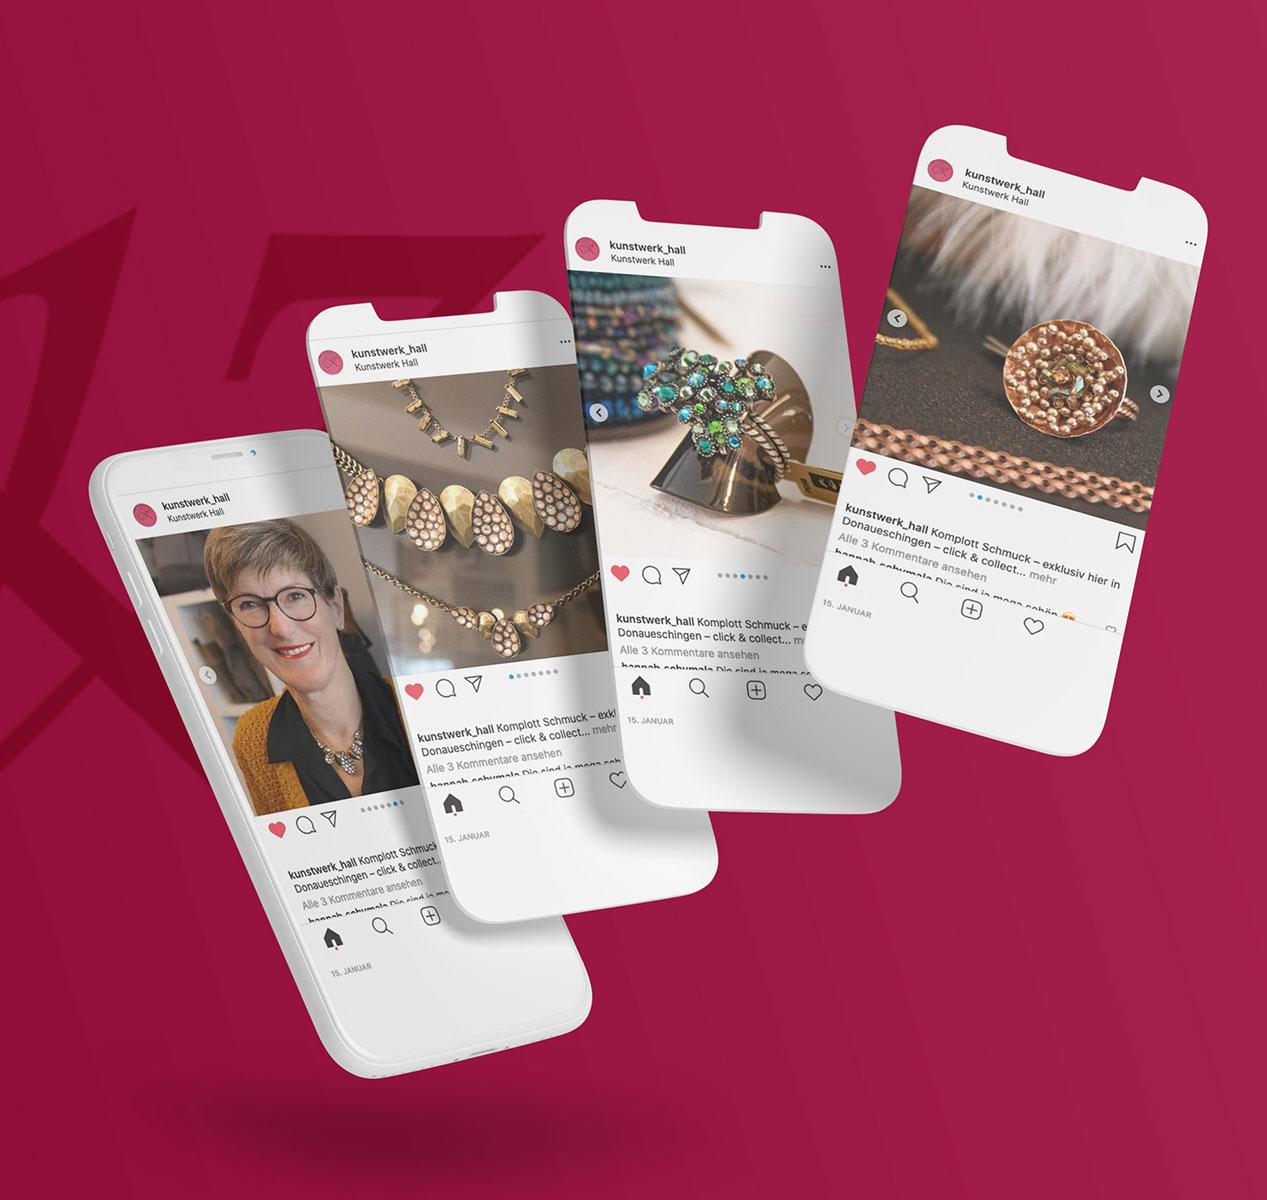 Social-Media-Beiträge von Kunstwerk Hall